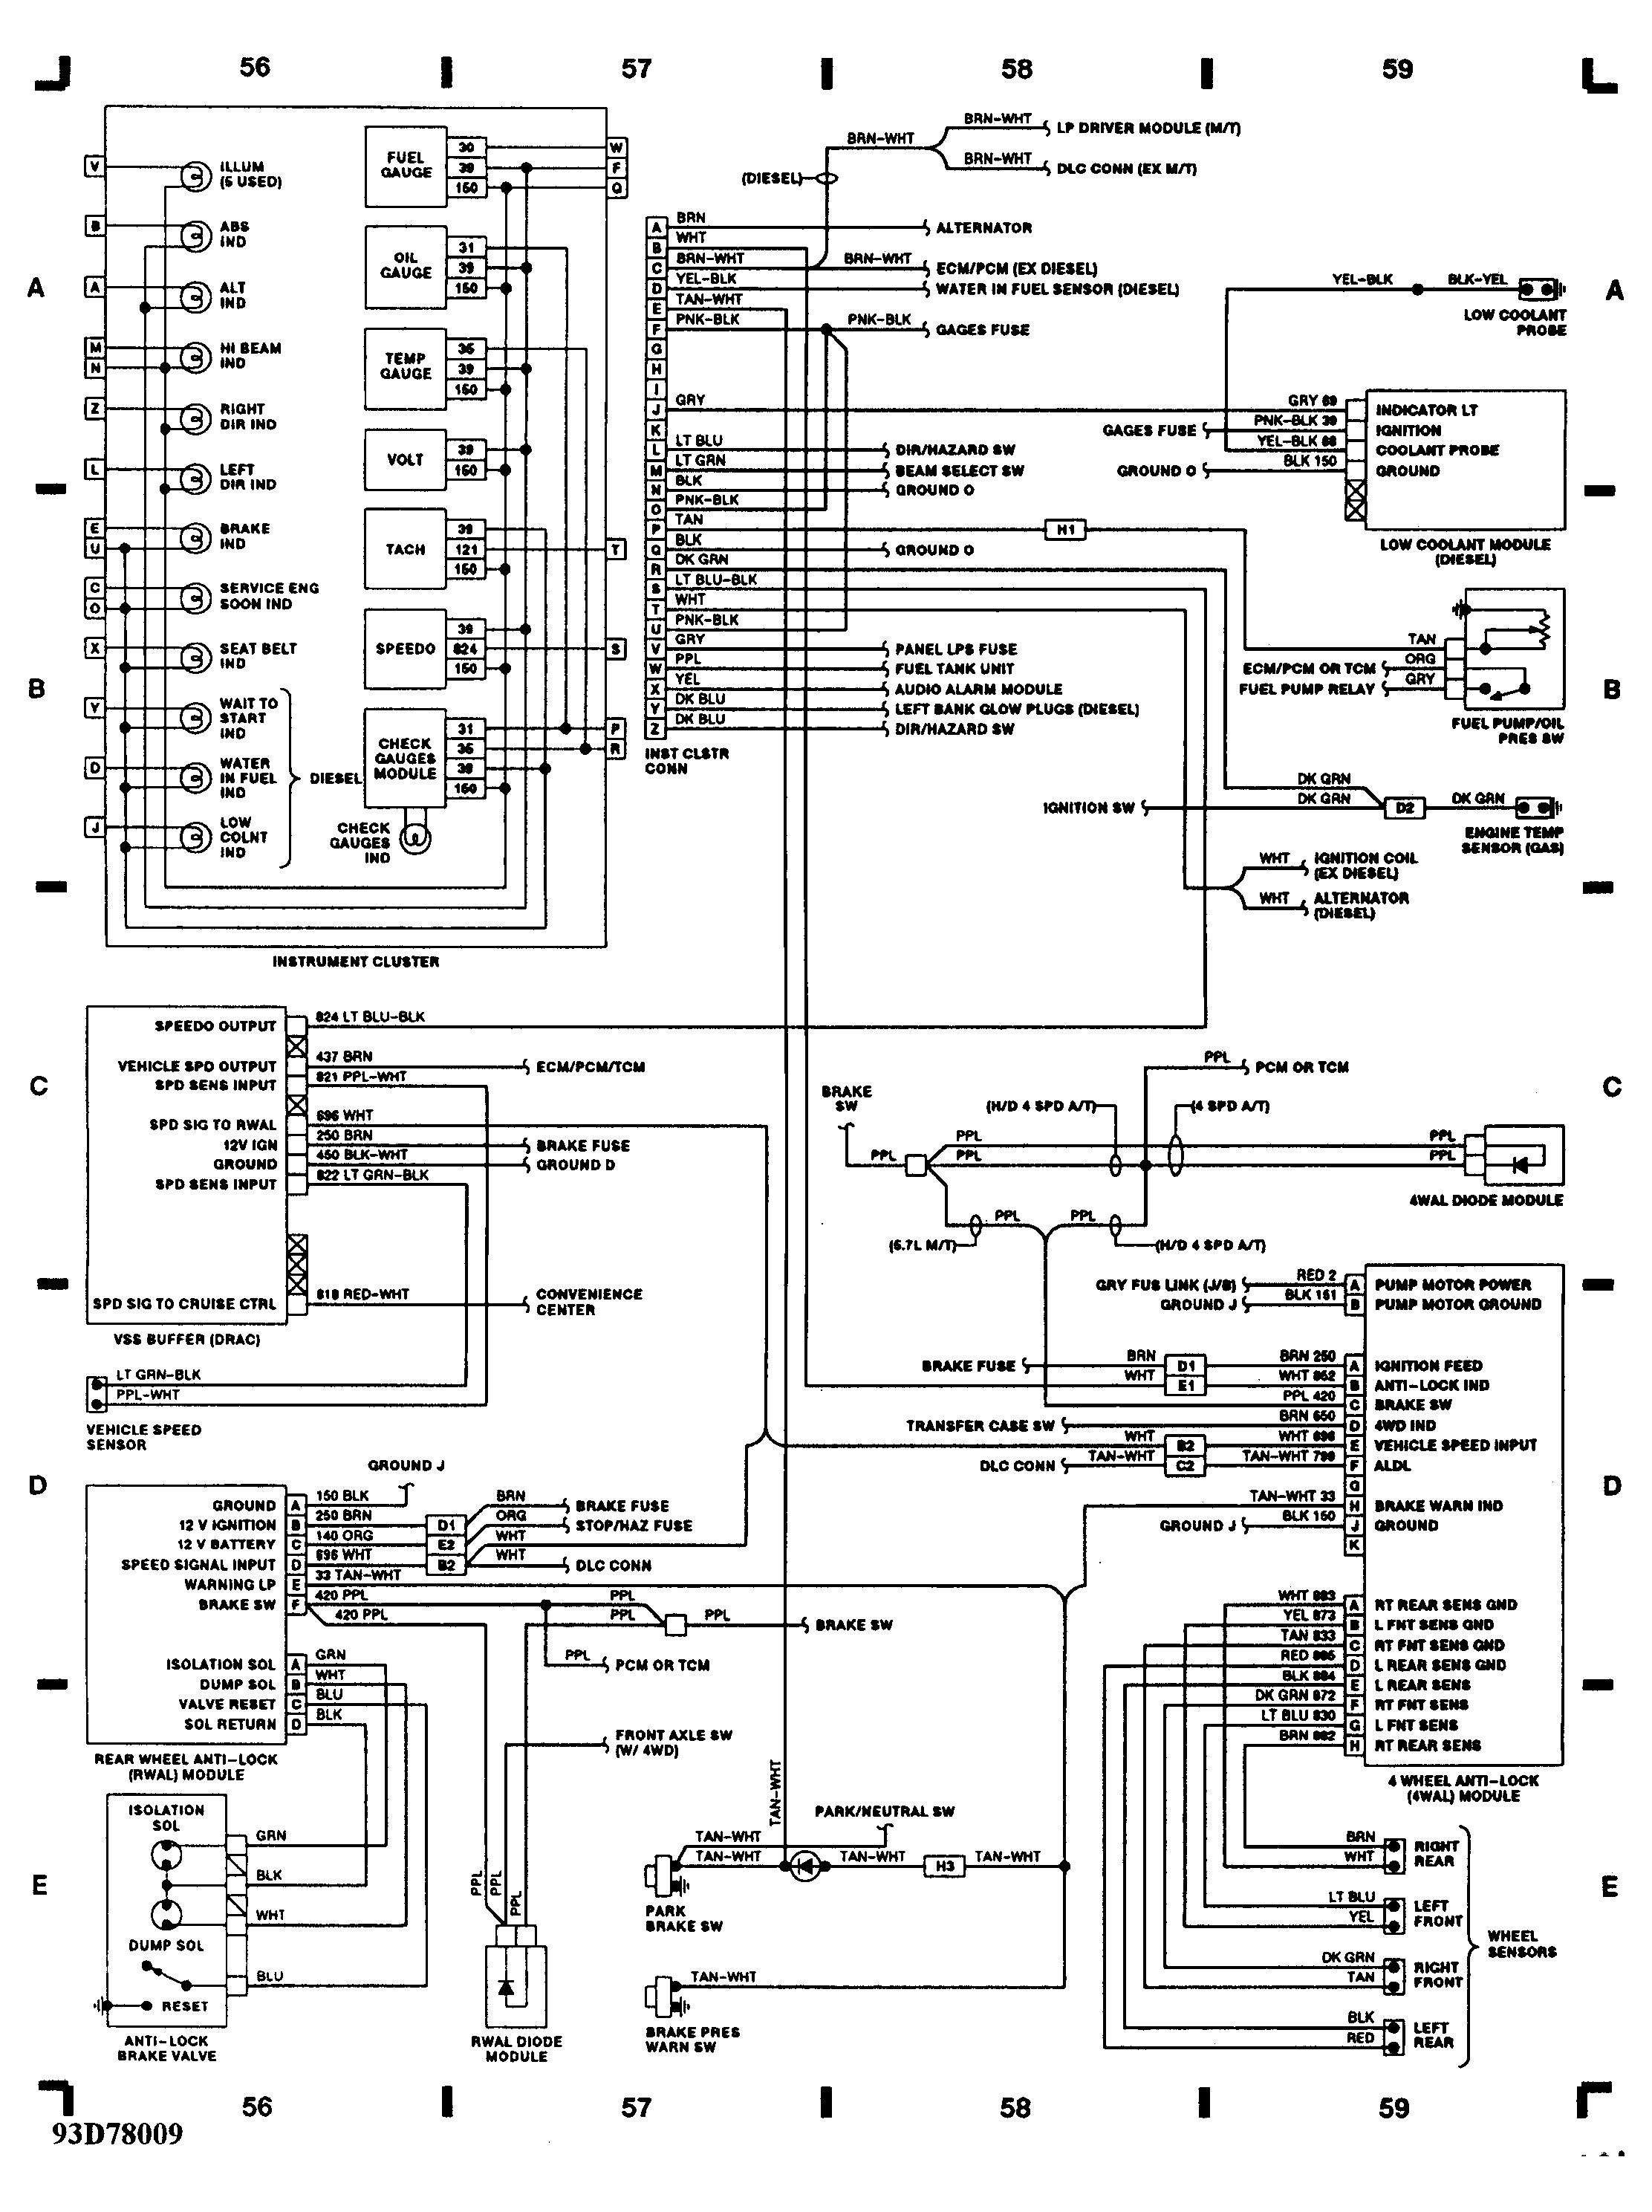 1993 Mustang Wiring Harness Diagram Unique Vortec Download Of 2224x2977